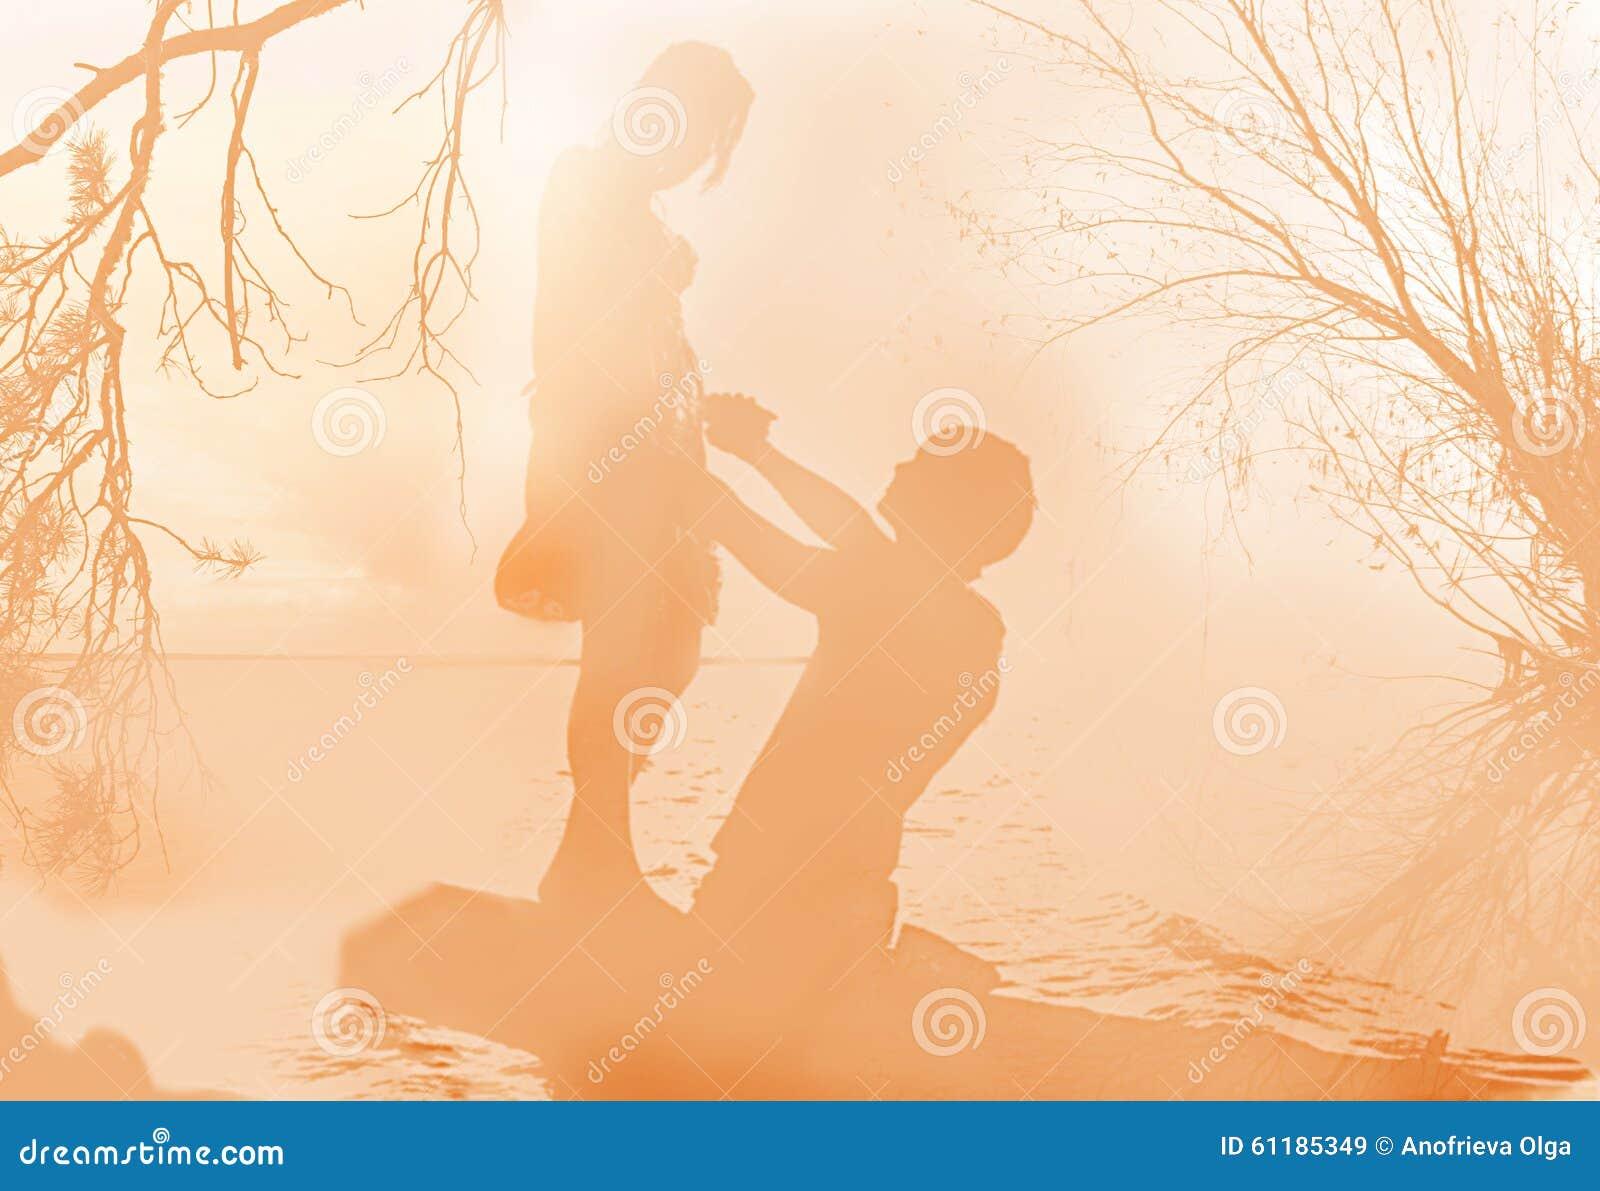 Delikatny romantyczny rendez-vous w ranek mgle